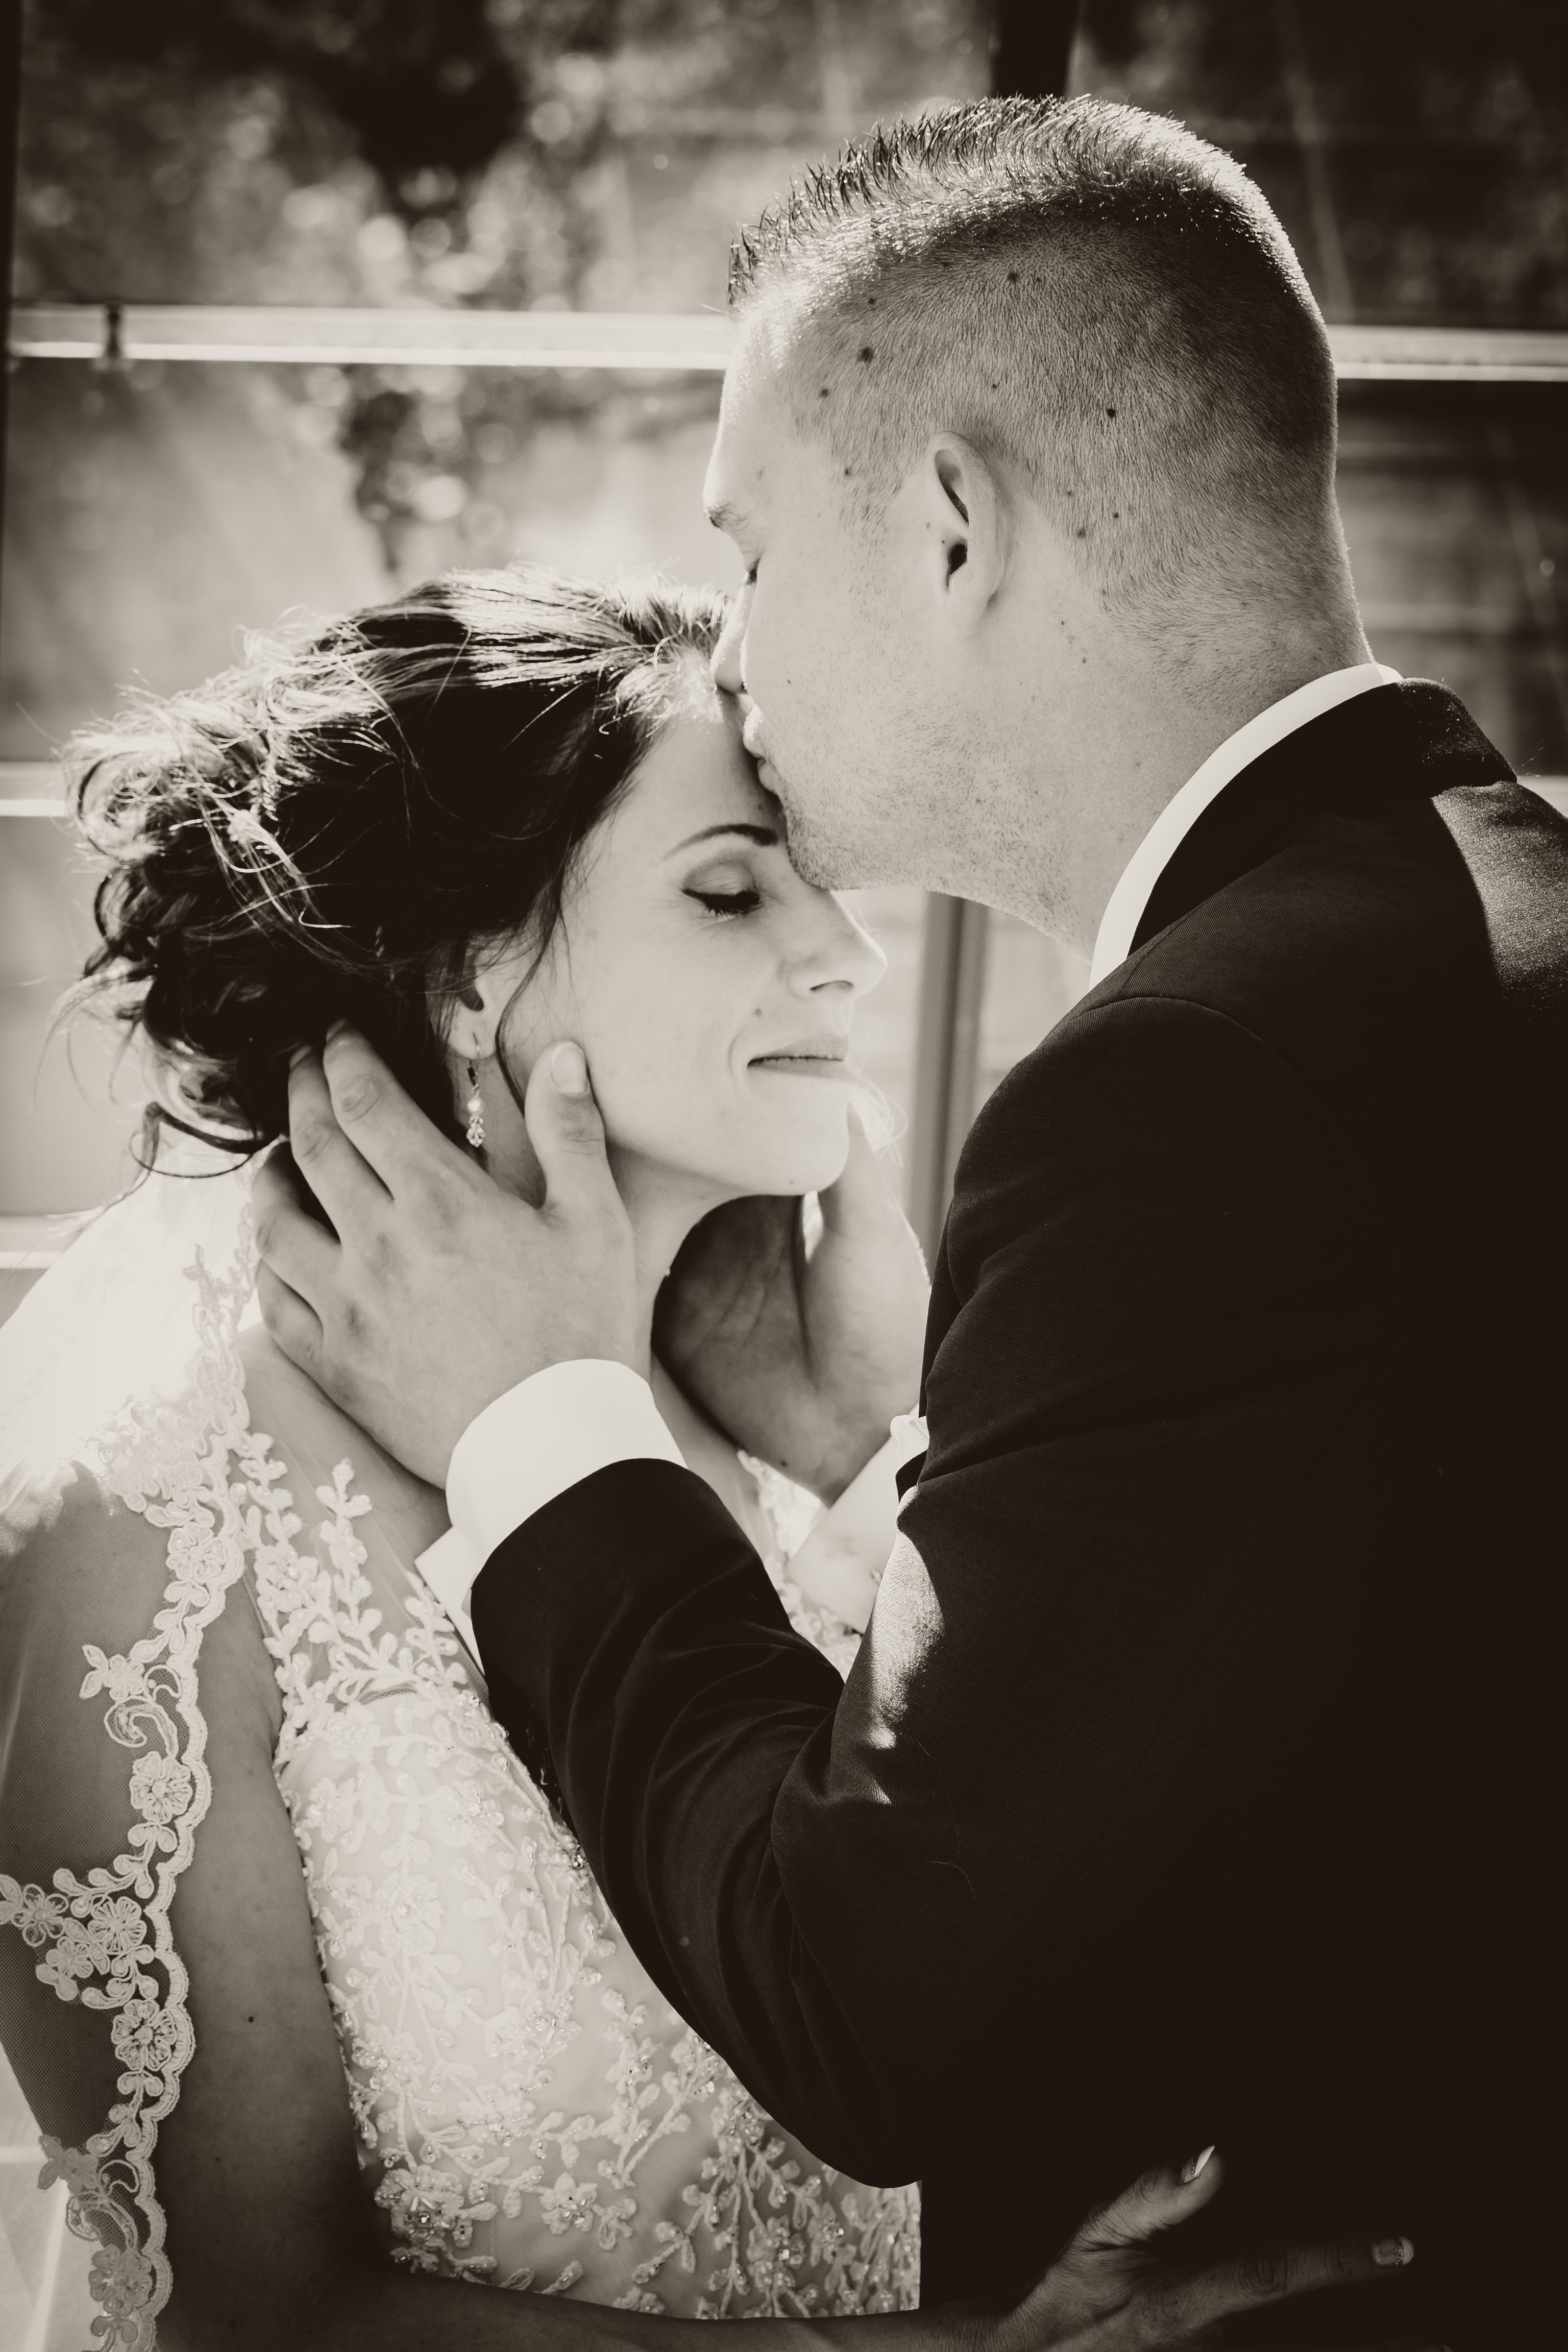 Wedding Photography Bruiloft Bride Groom Kiss